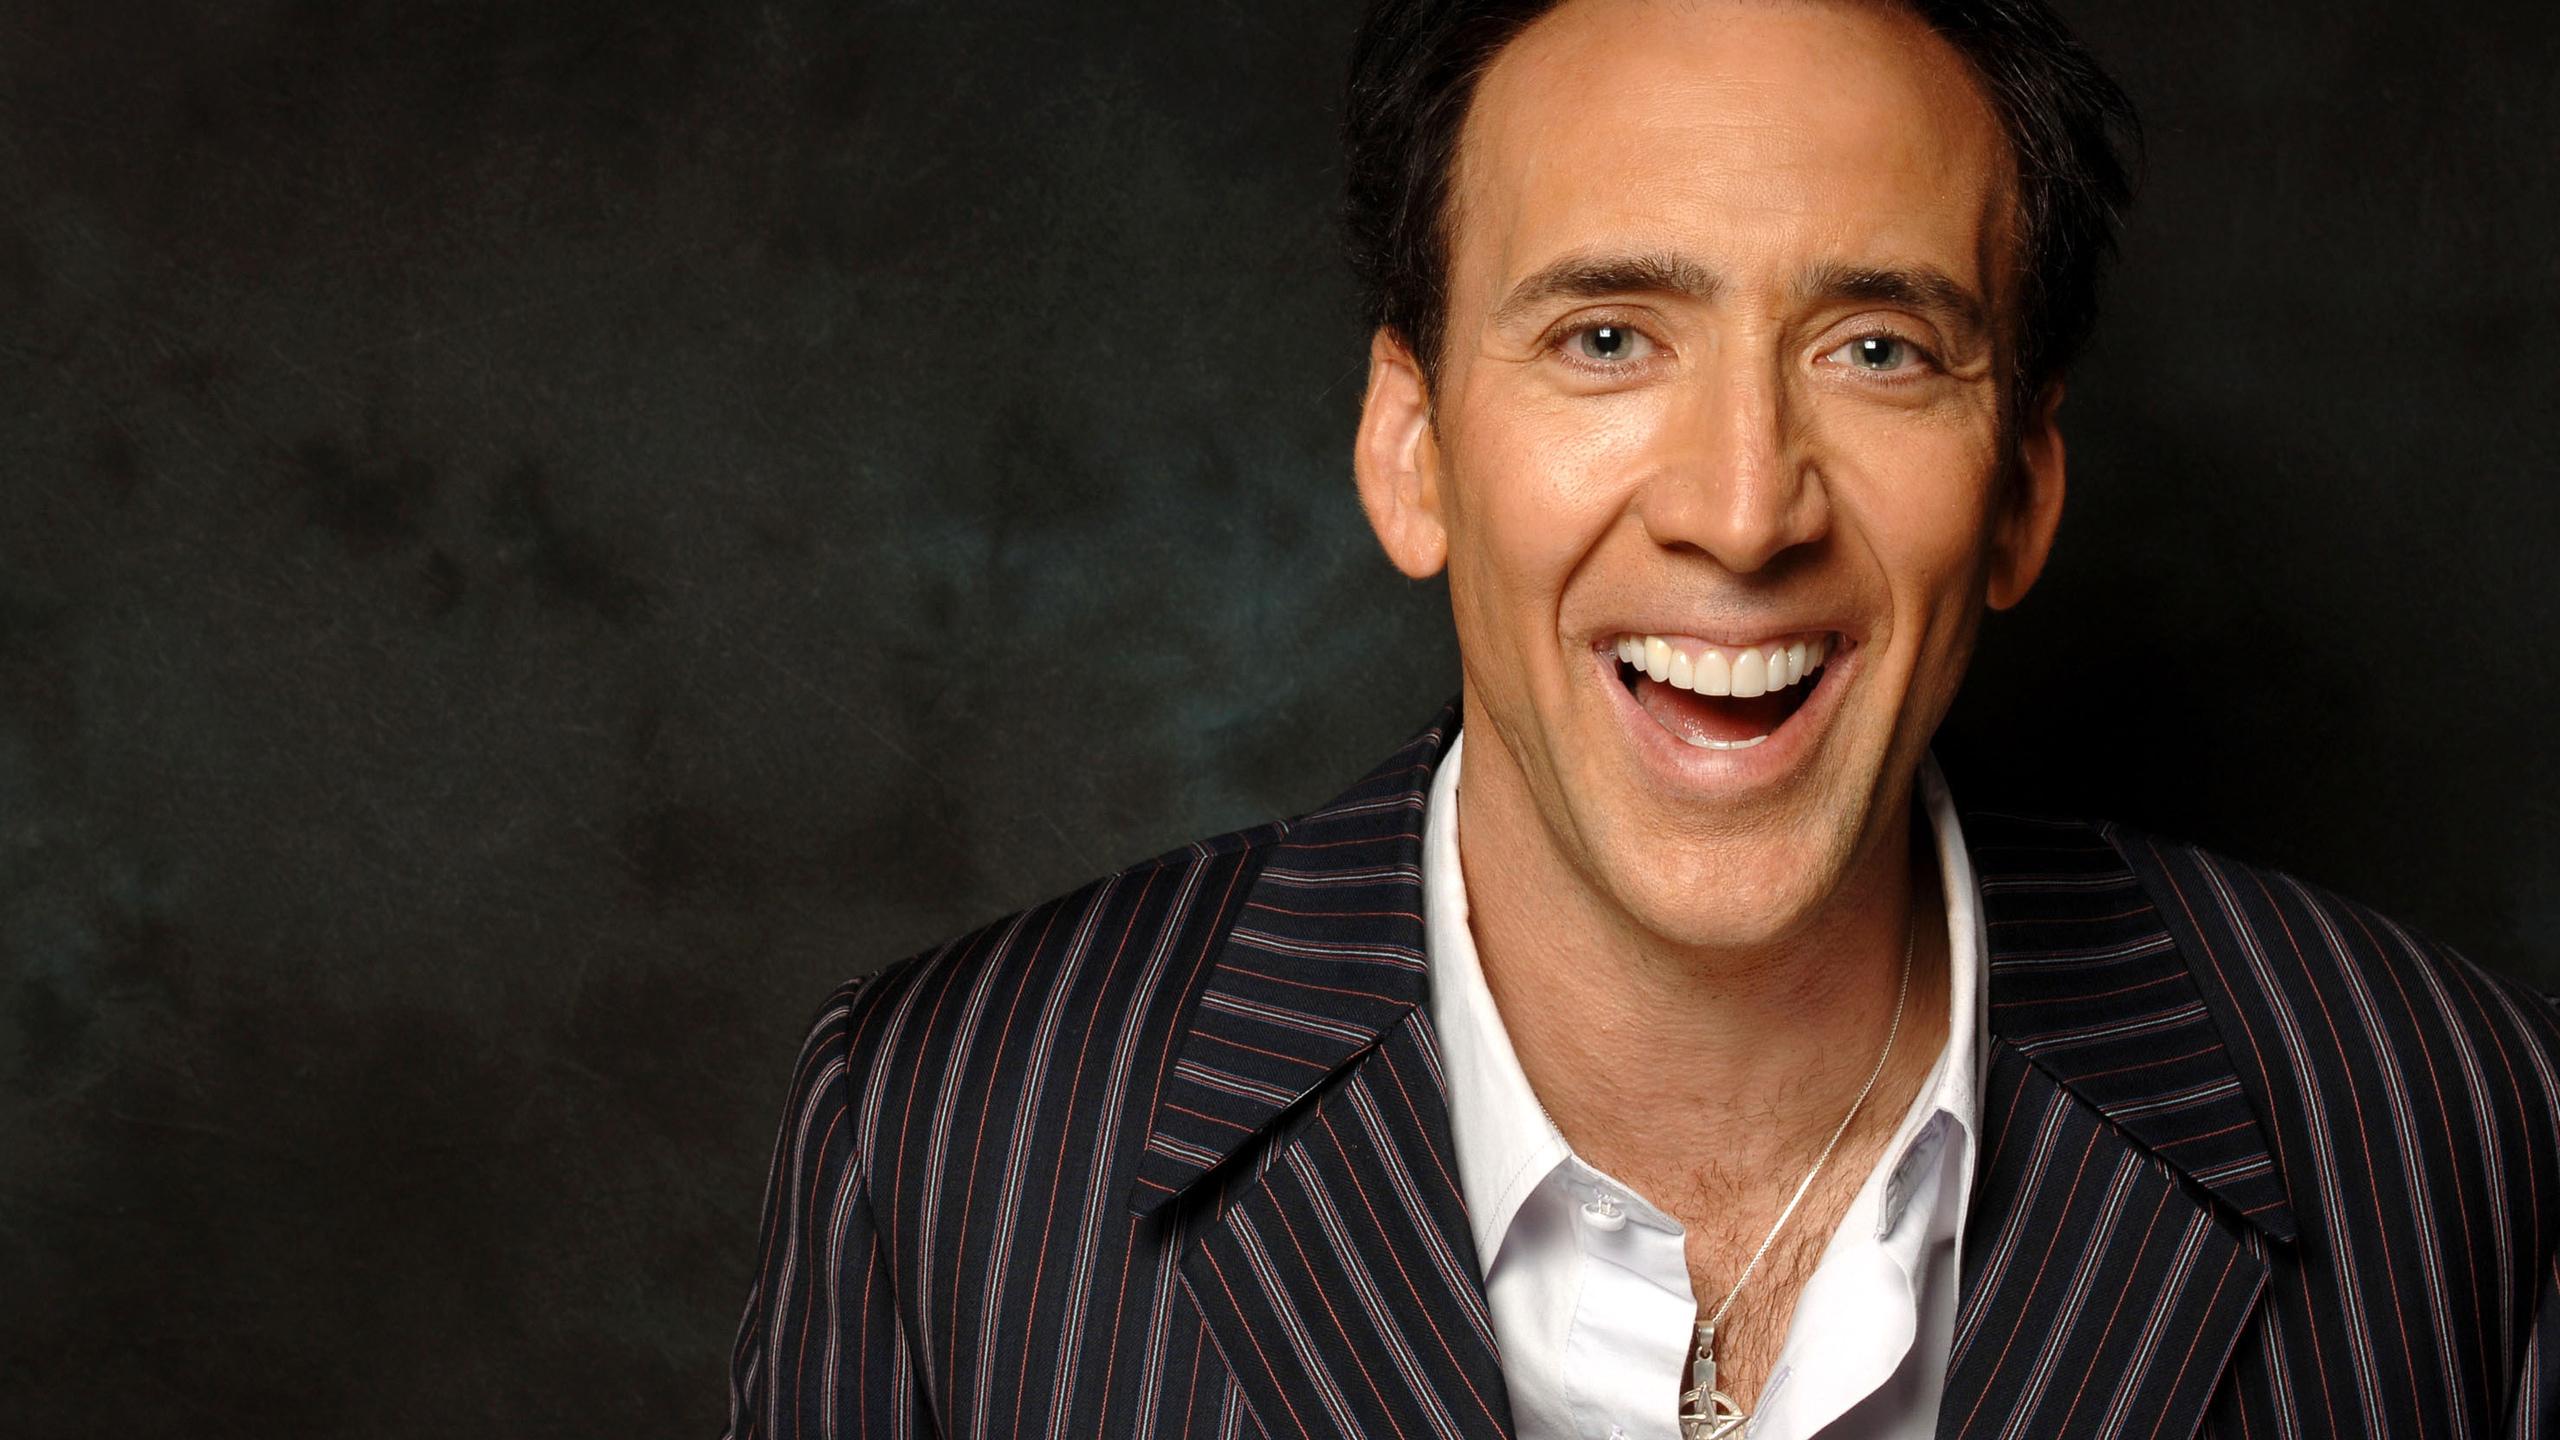 33] Nicolas Cage Wallpapers on WallpaperSafari 2560x1440